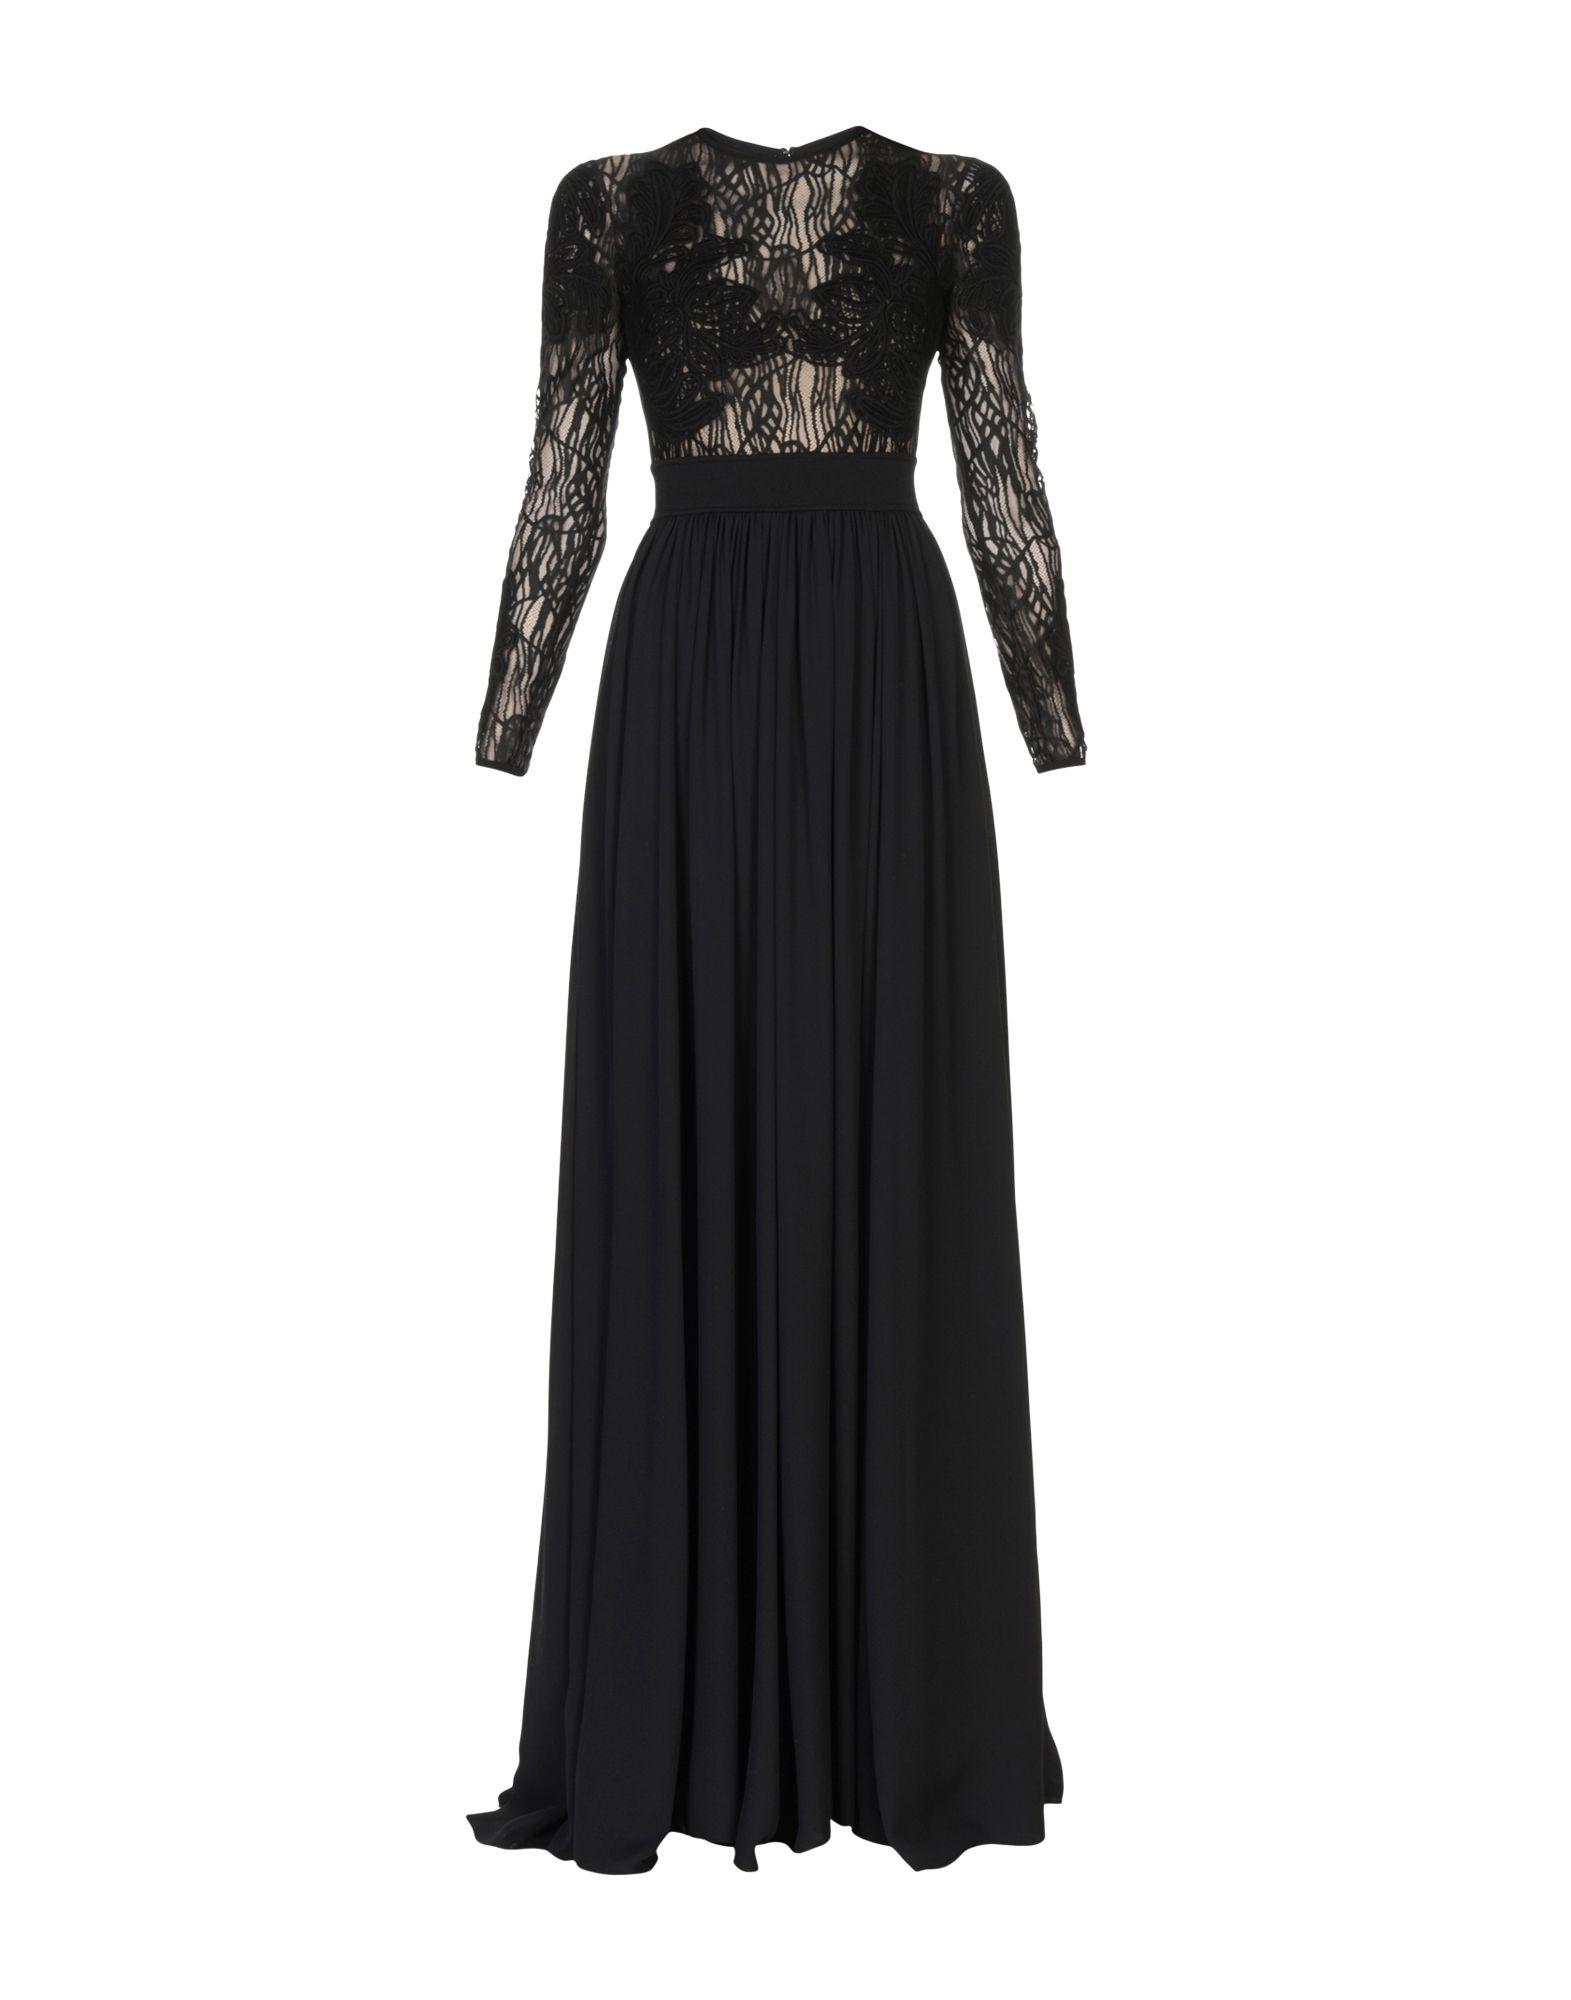 ELIE SAAB Длинное платье вечернее платье mermaid dress vestido noiva 2015 w006 elie saab evening dress